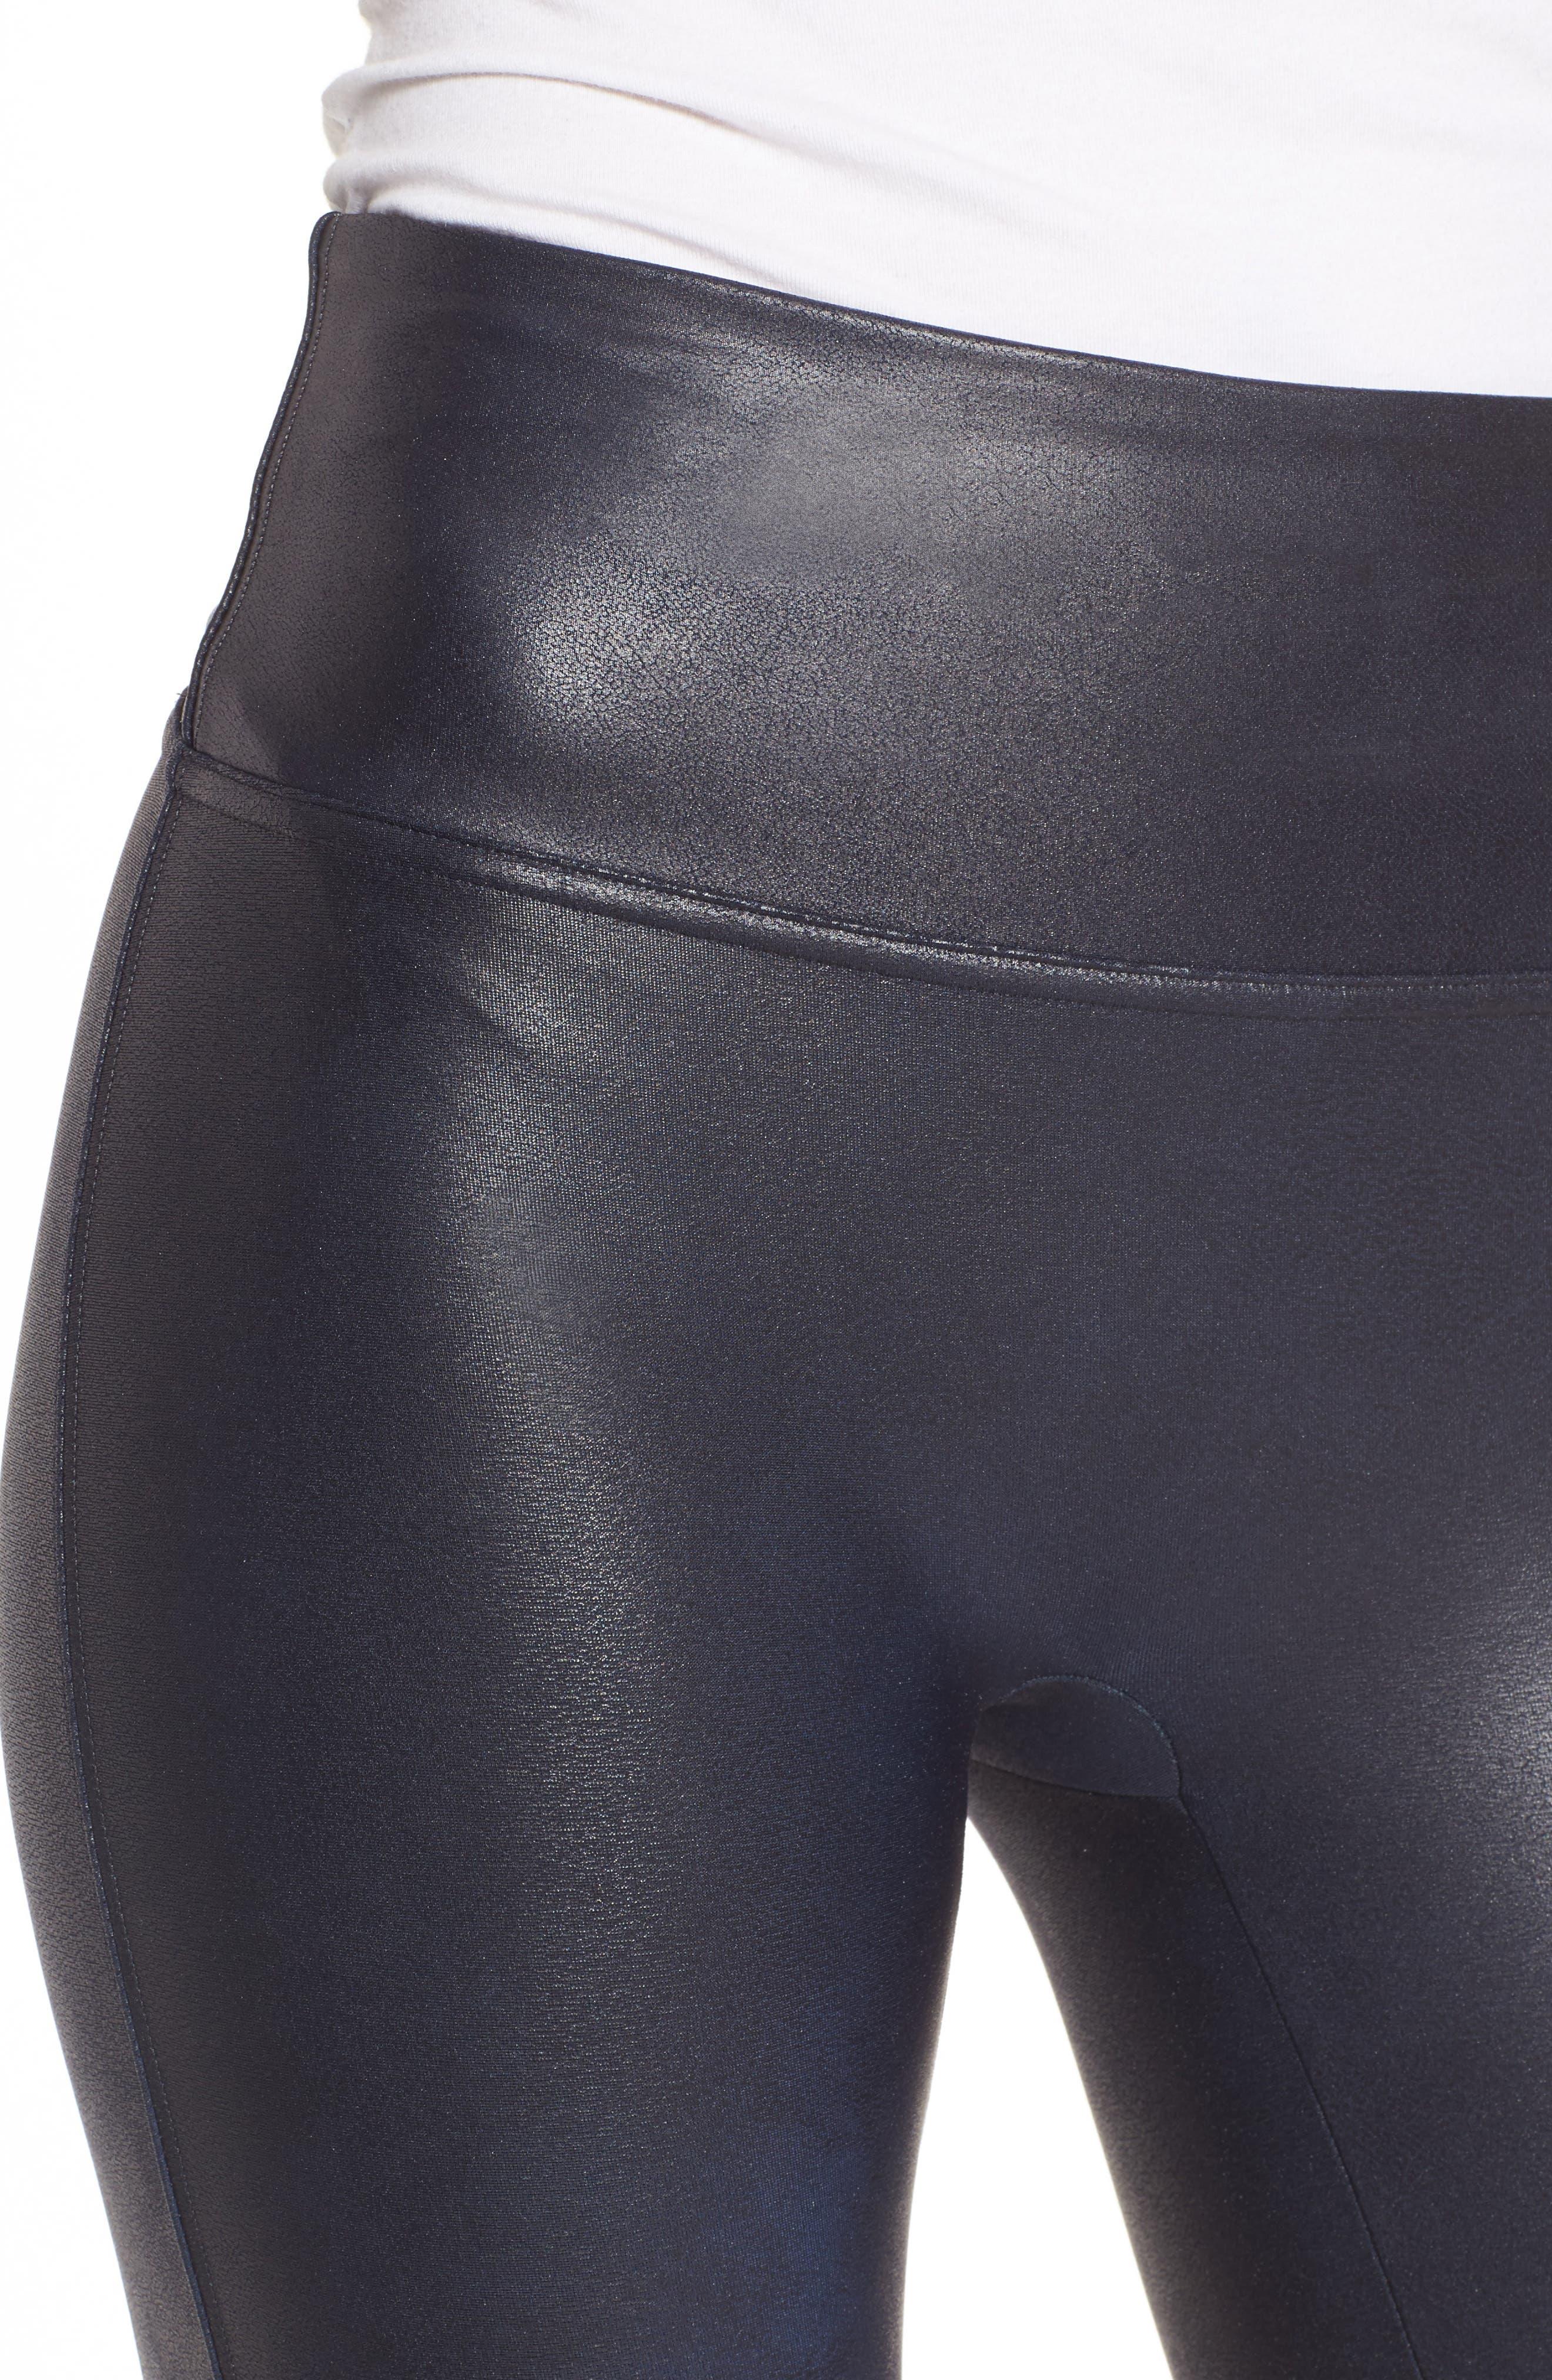 Alternate Image 4  - SPANX® Faux Leather Leggings